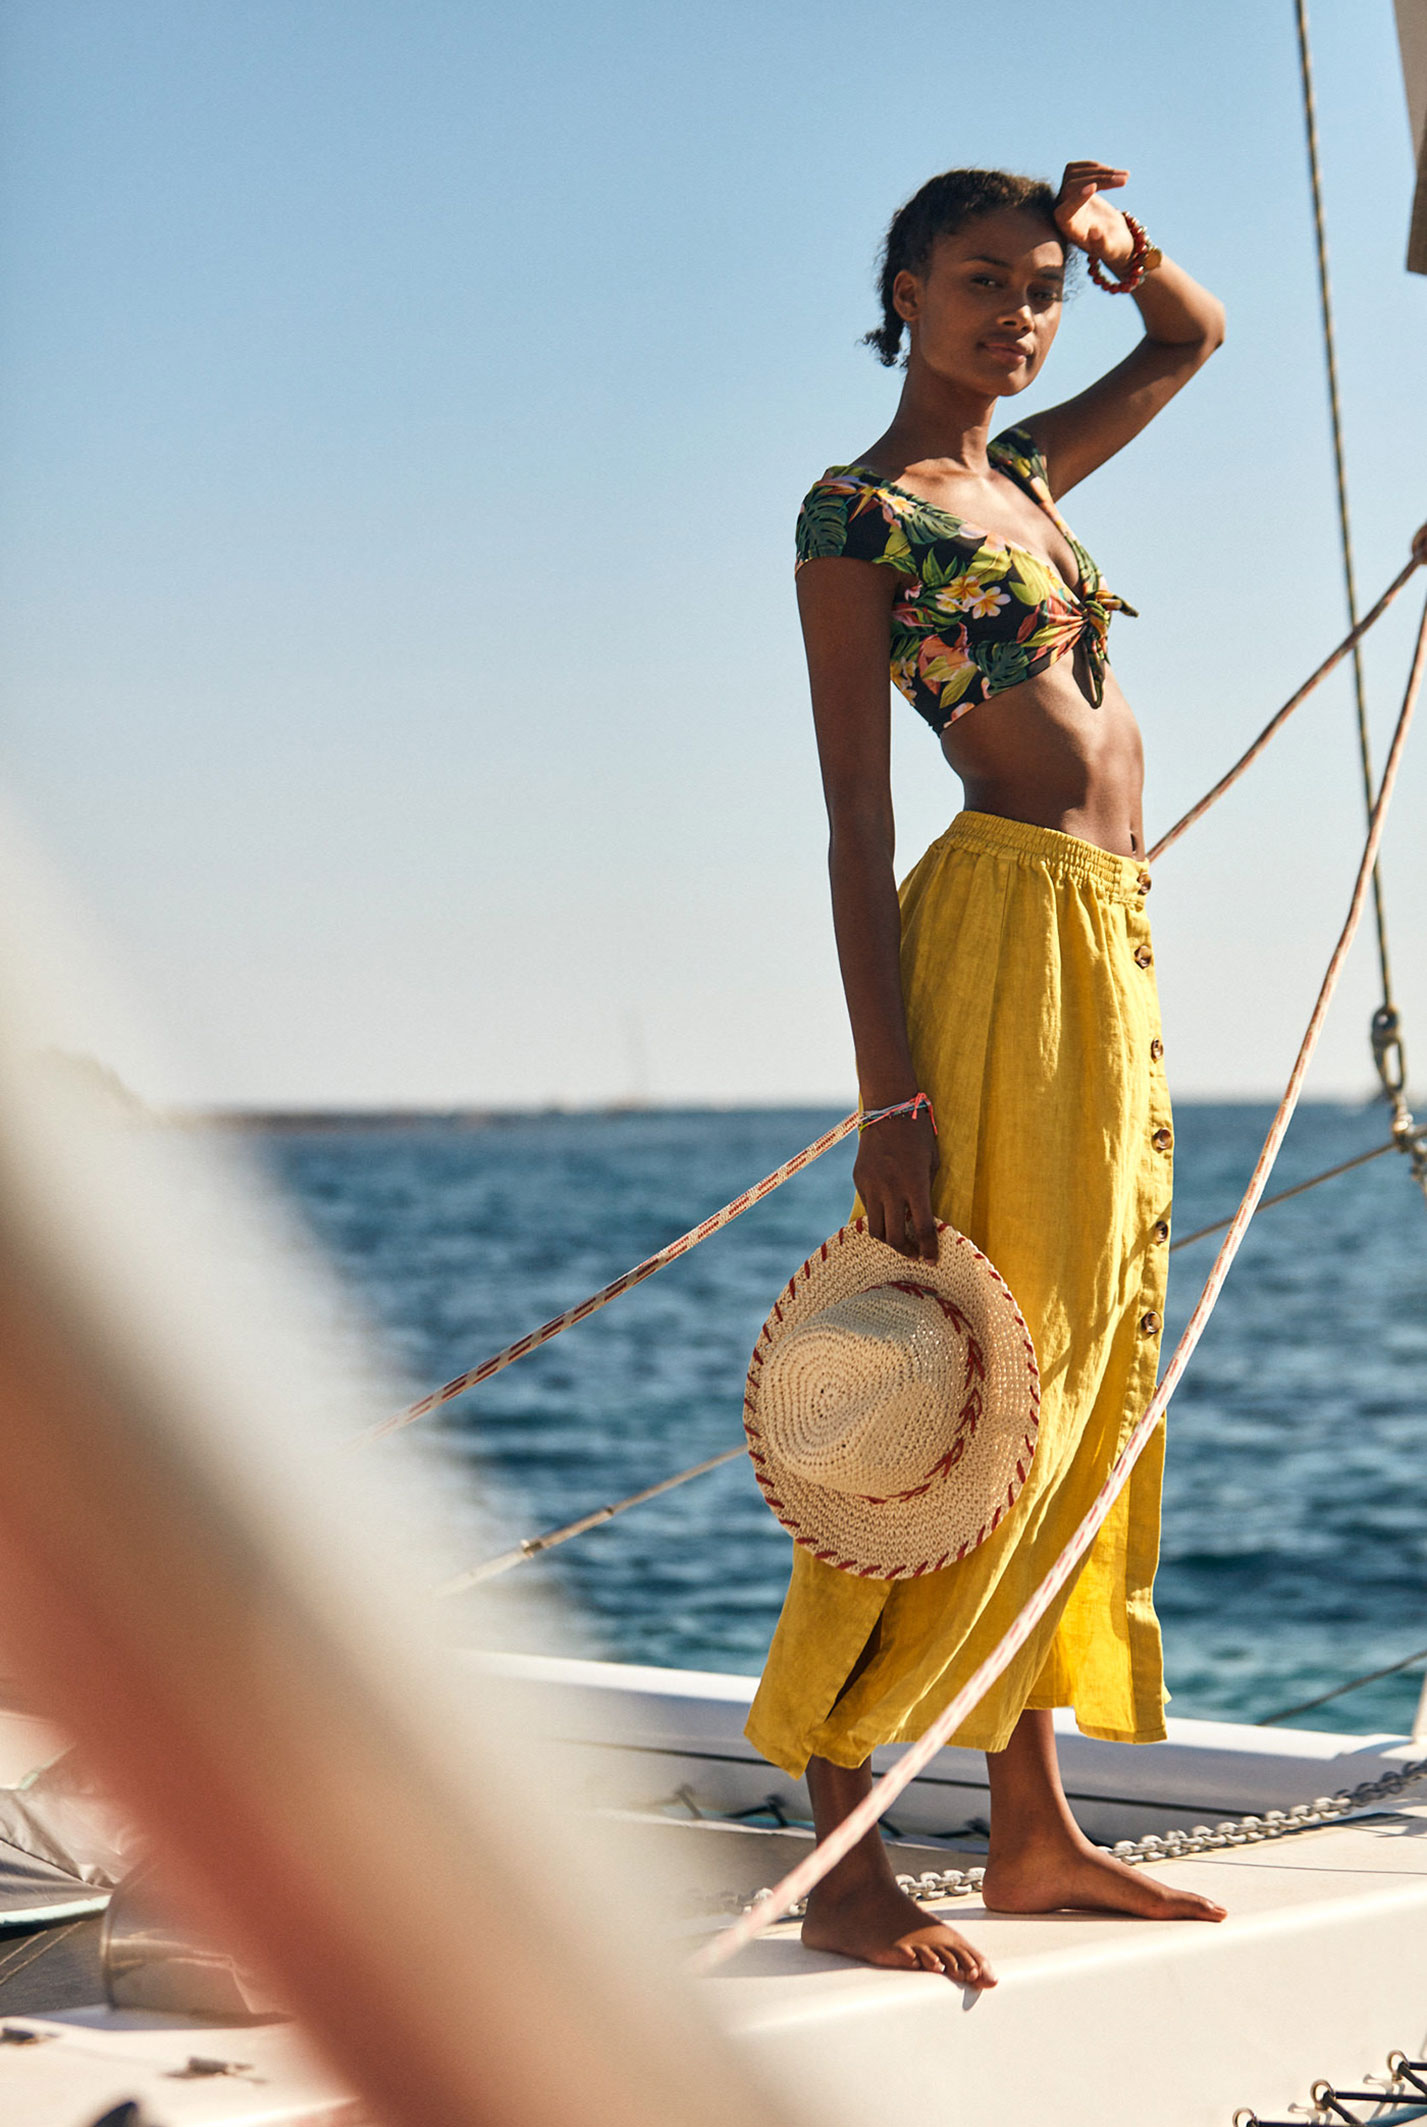 Делми Виейра в купальниках модного бренда Banana Moon, лето 2021 / фото 04